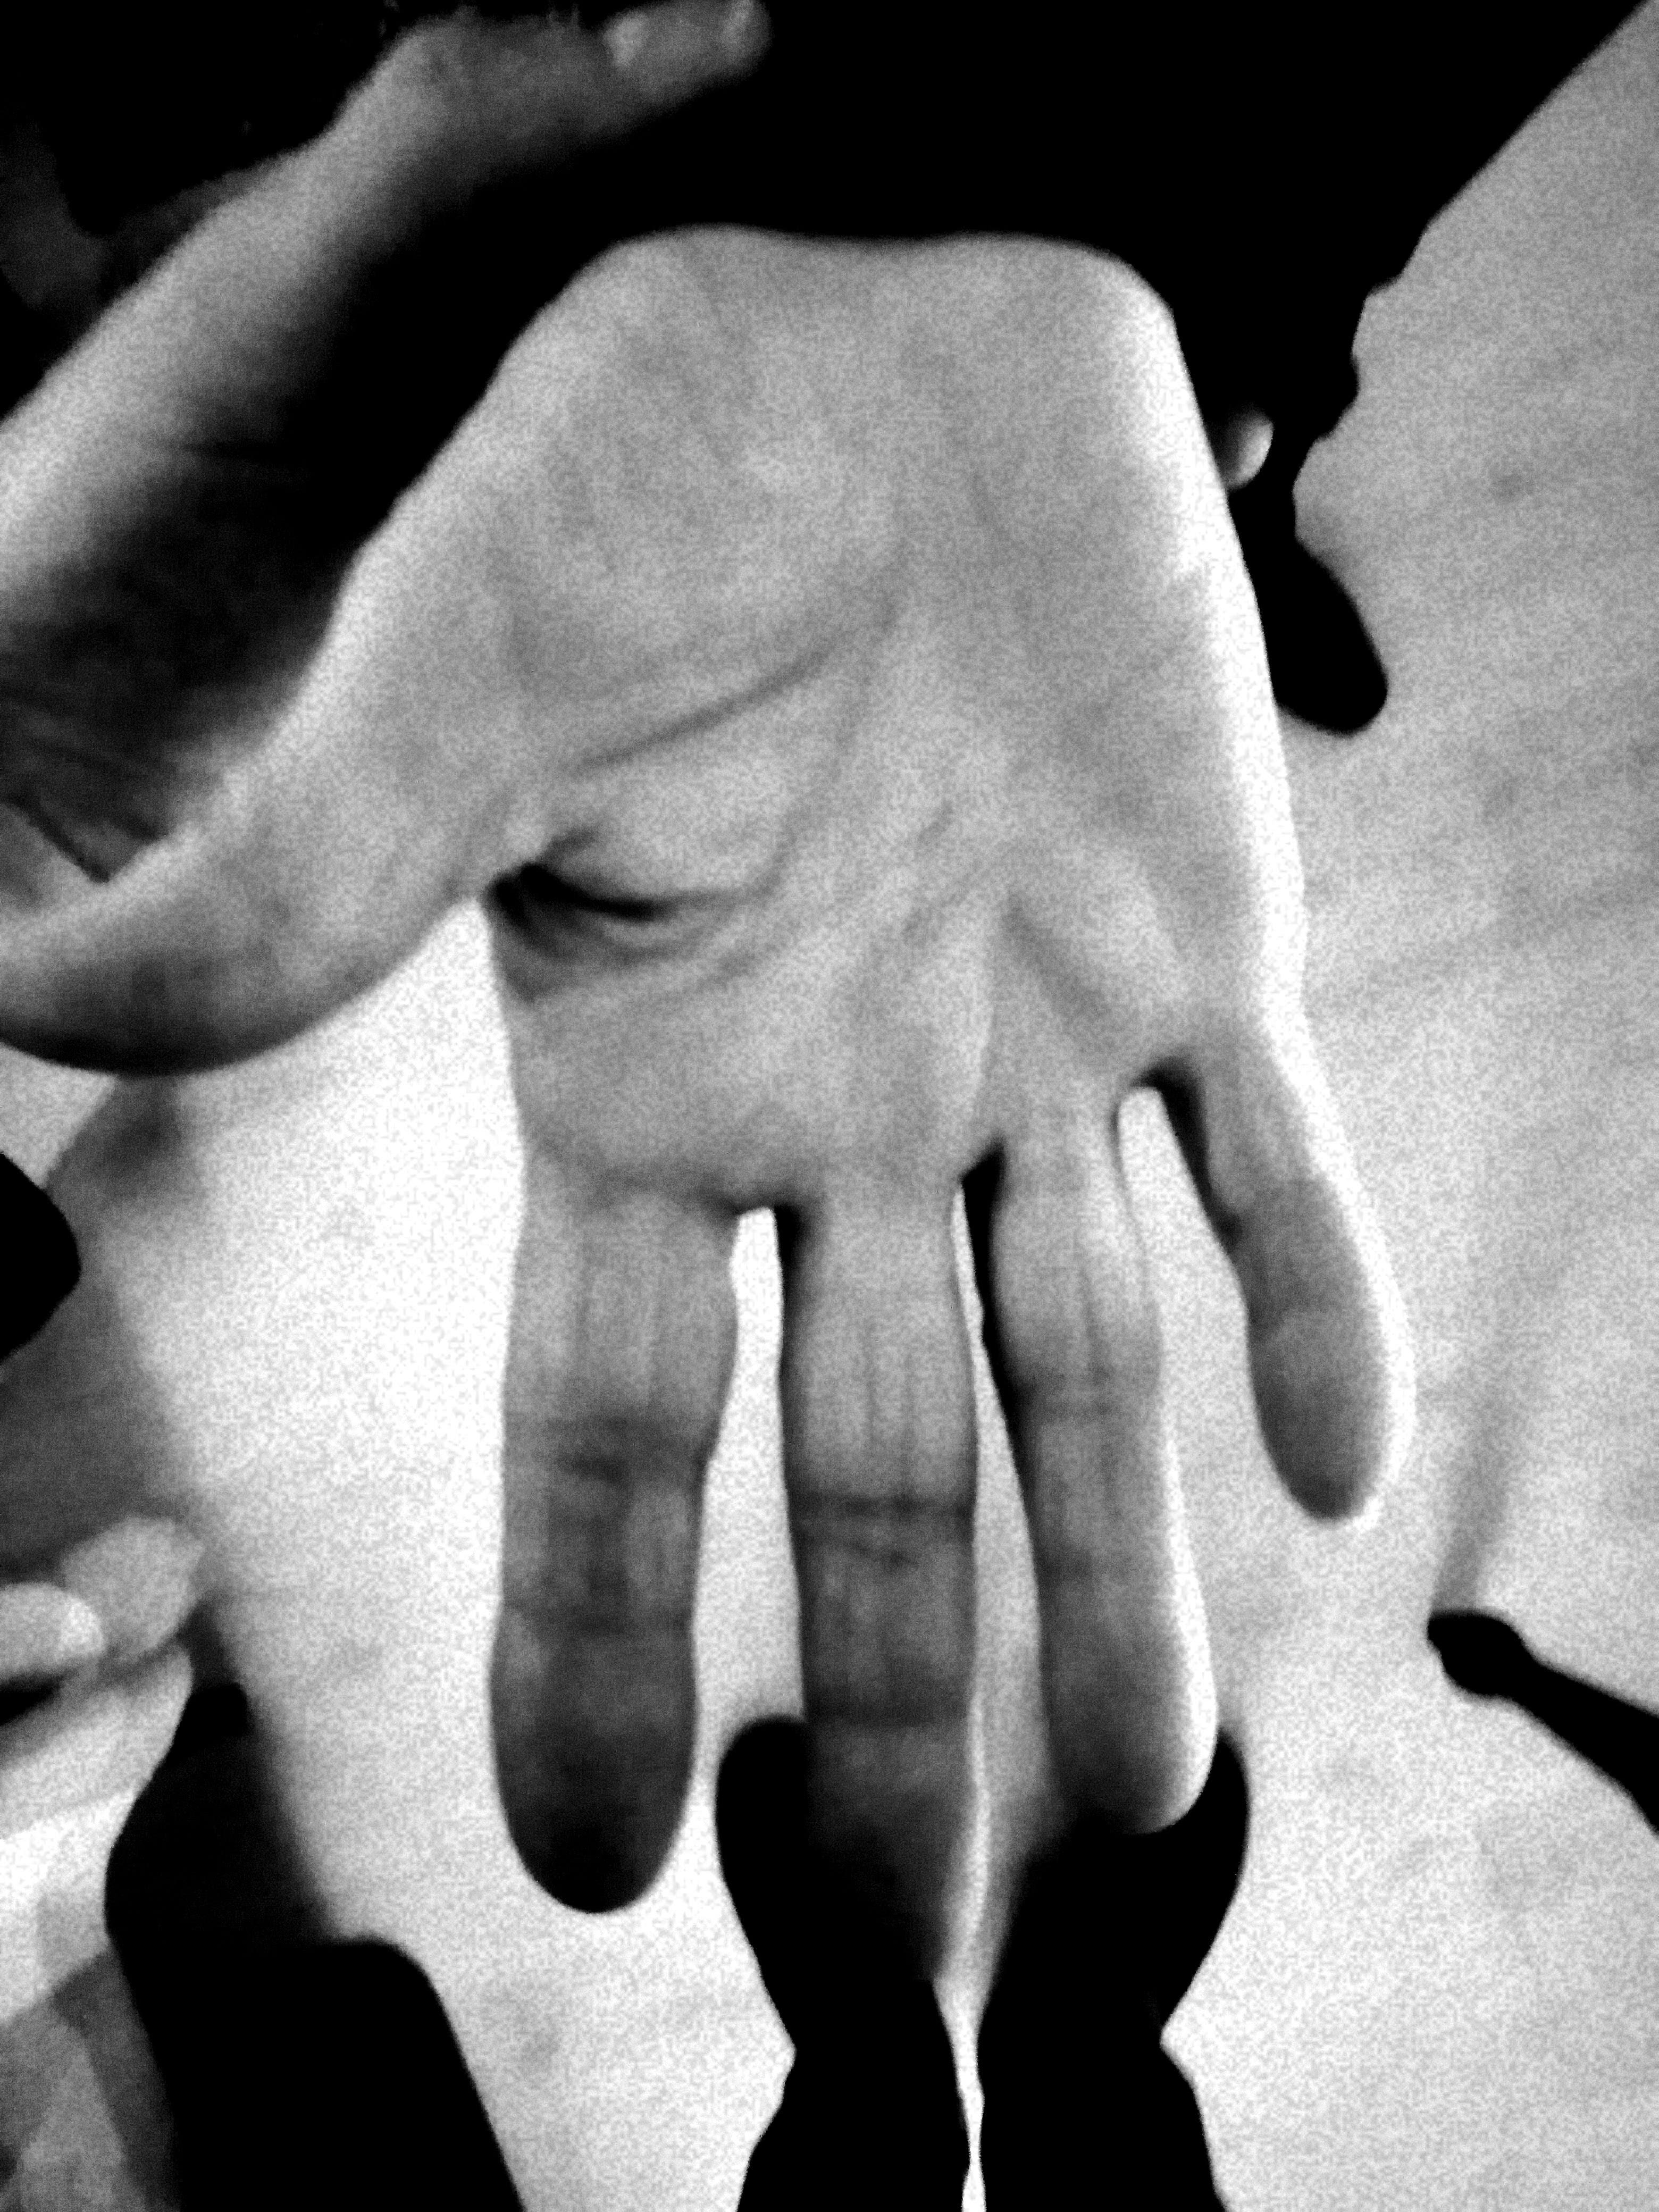 étude de la main